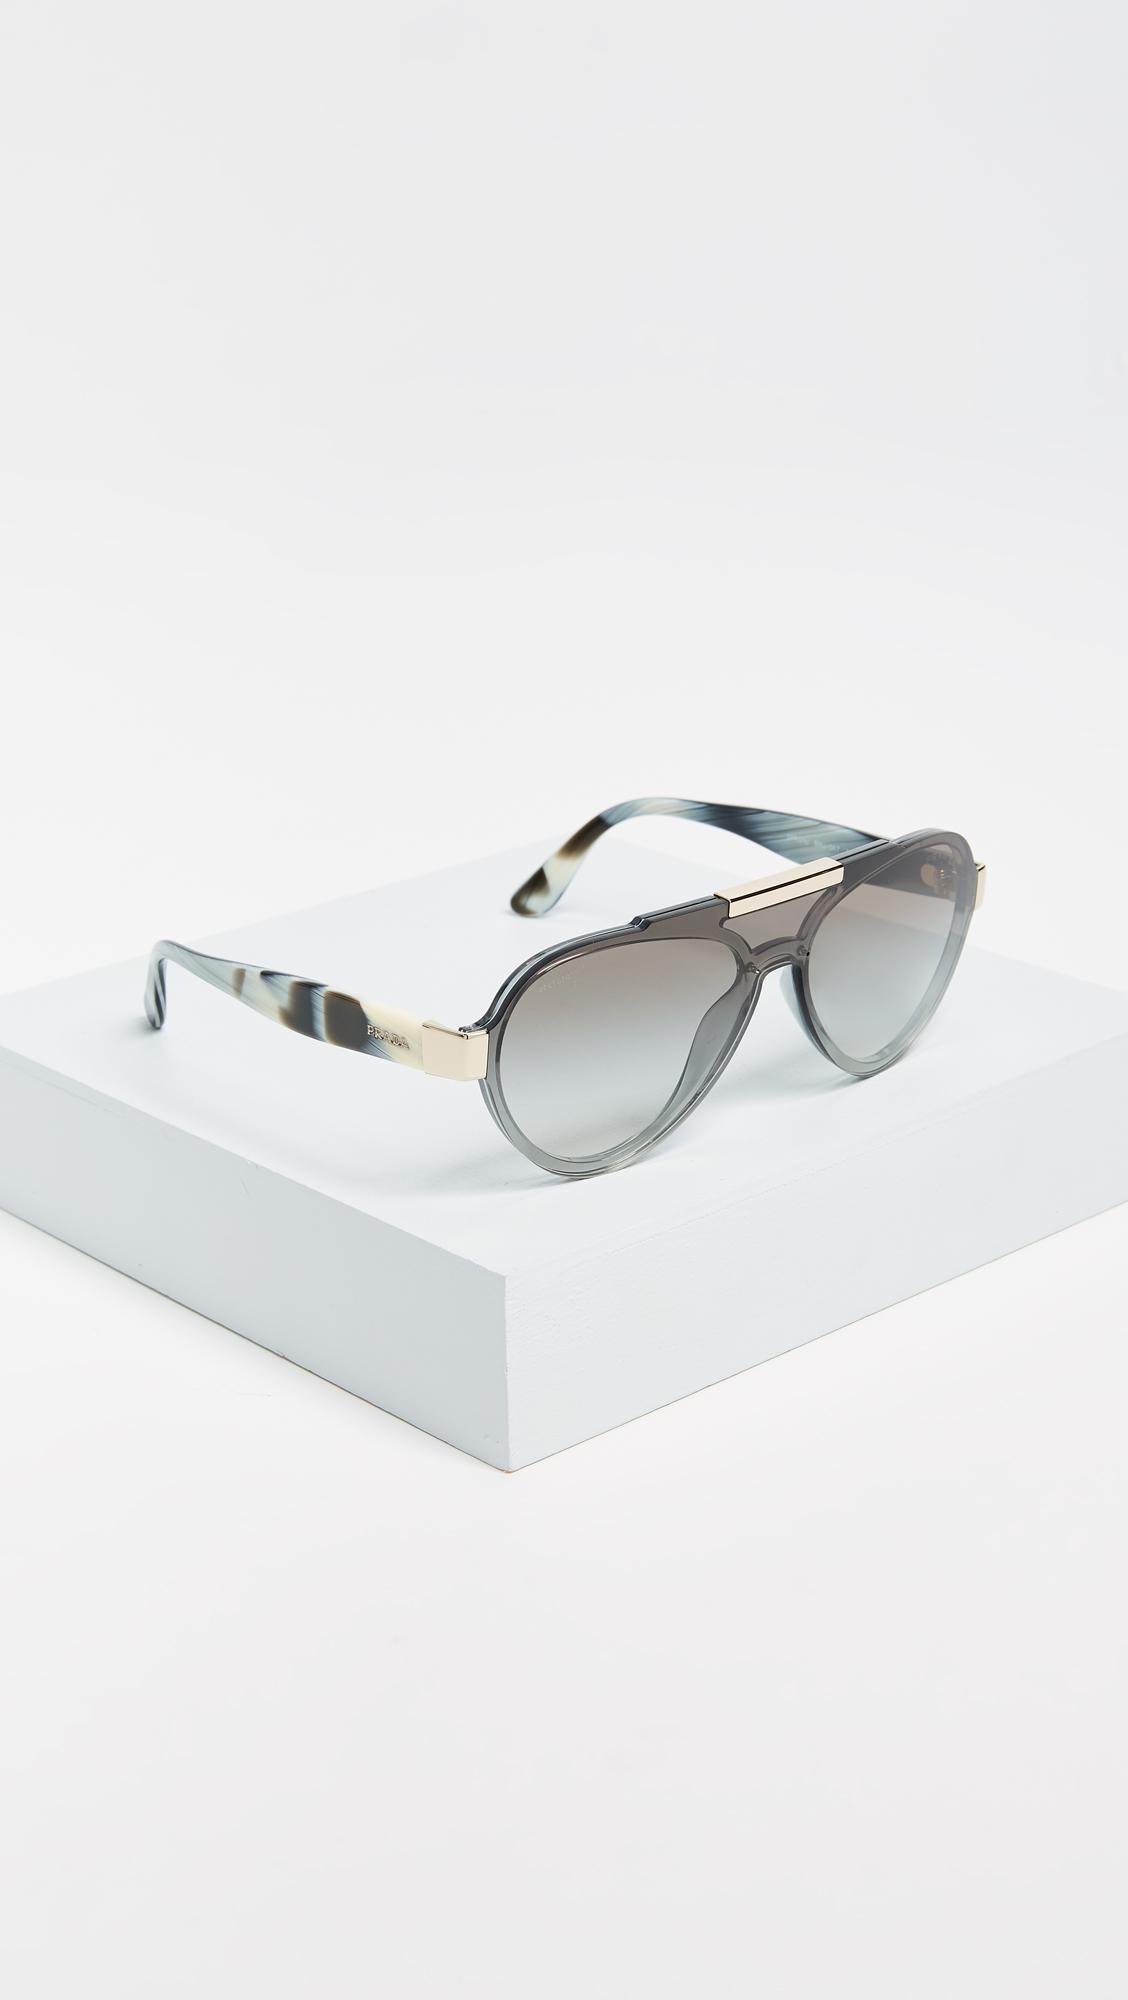 Prada Man Special Sunglasses in Grey/Grey (Grey)